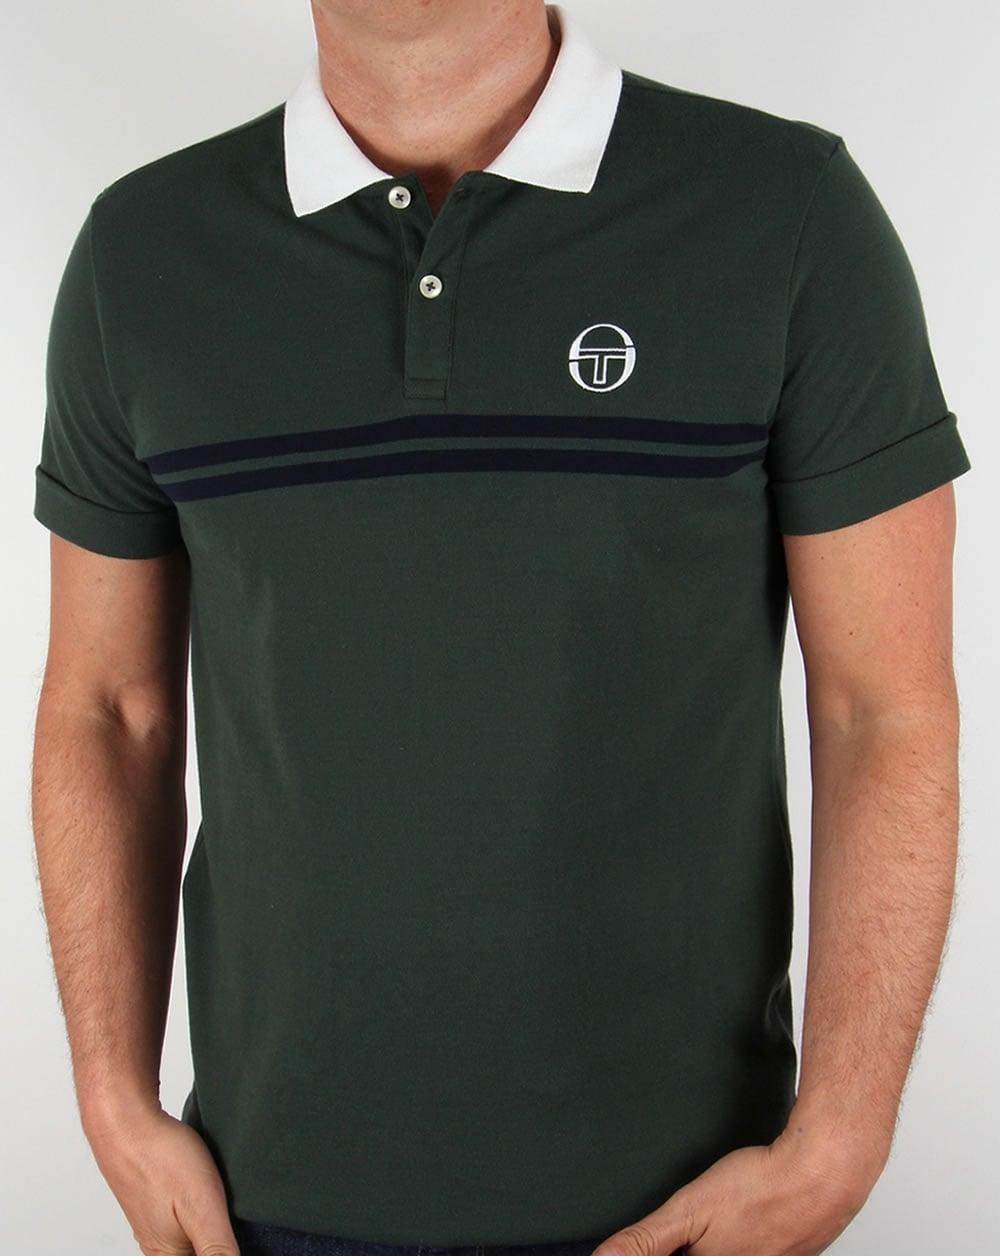 Sergio tacchini super mac polo shirt forest green white for Forest green polo shirts